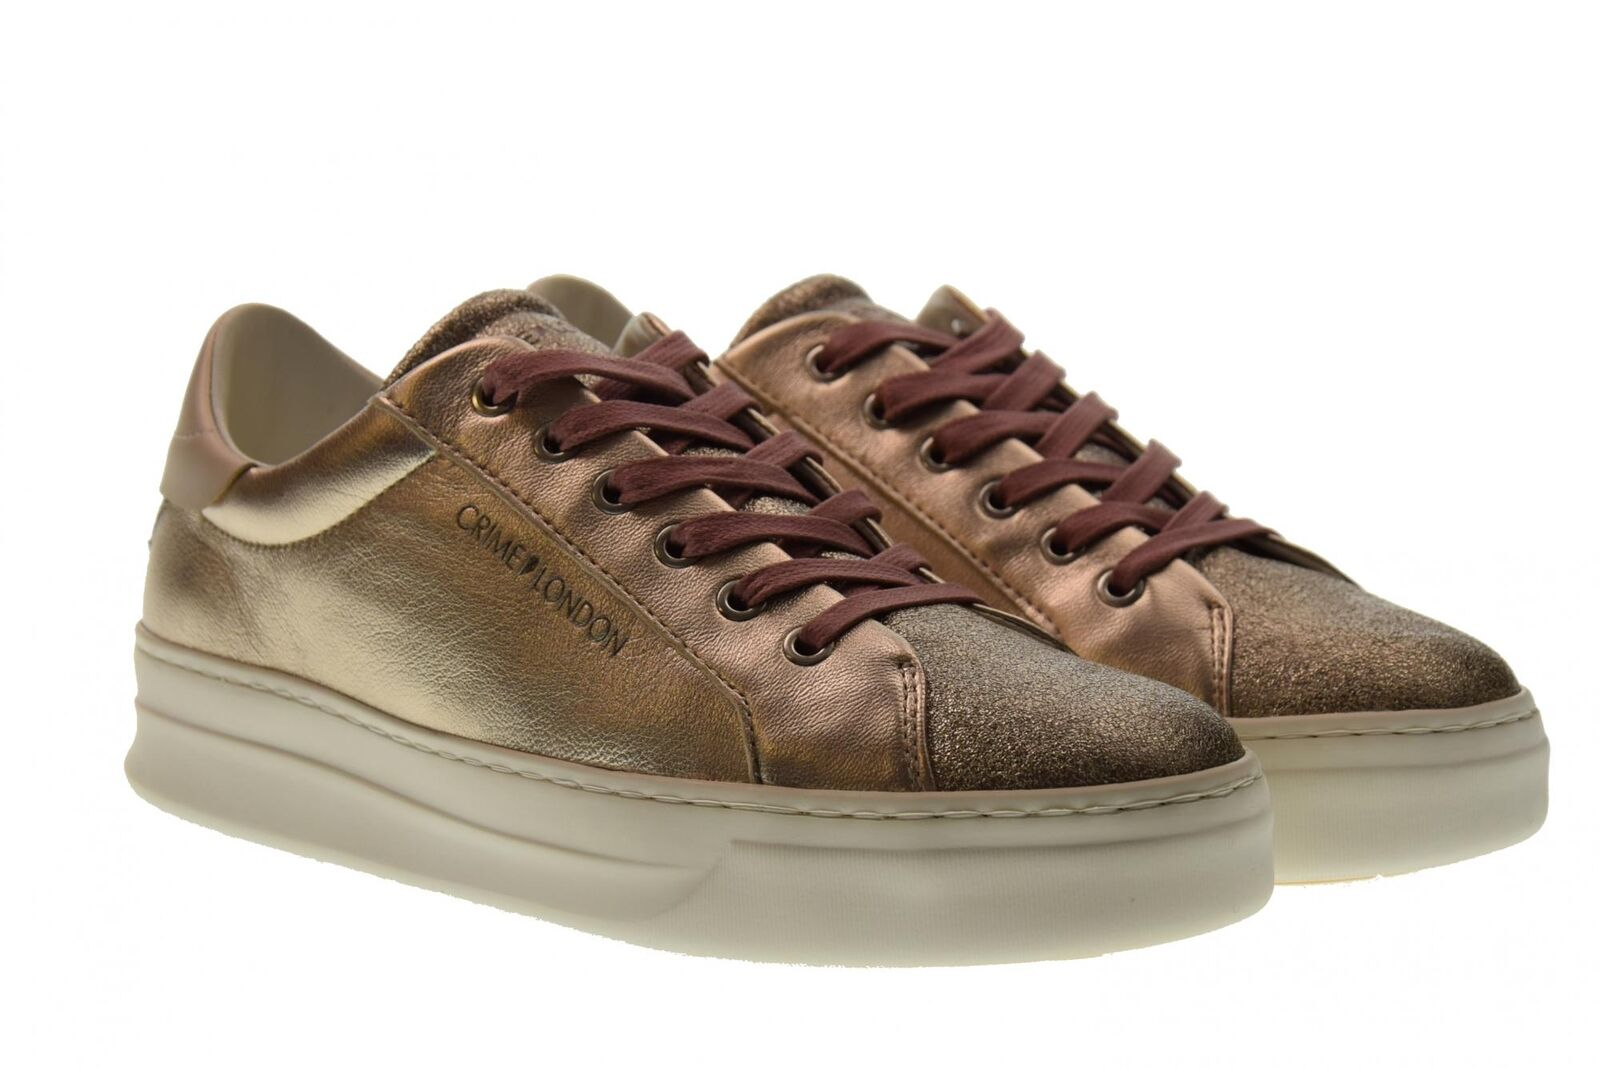 CRIME P19u  donna scarpe basse 25600PP1.26 SONIC  buona qualità